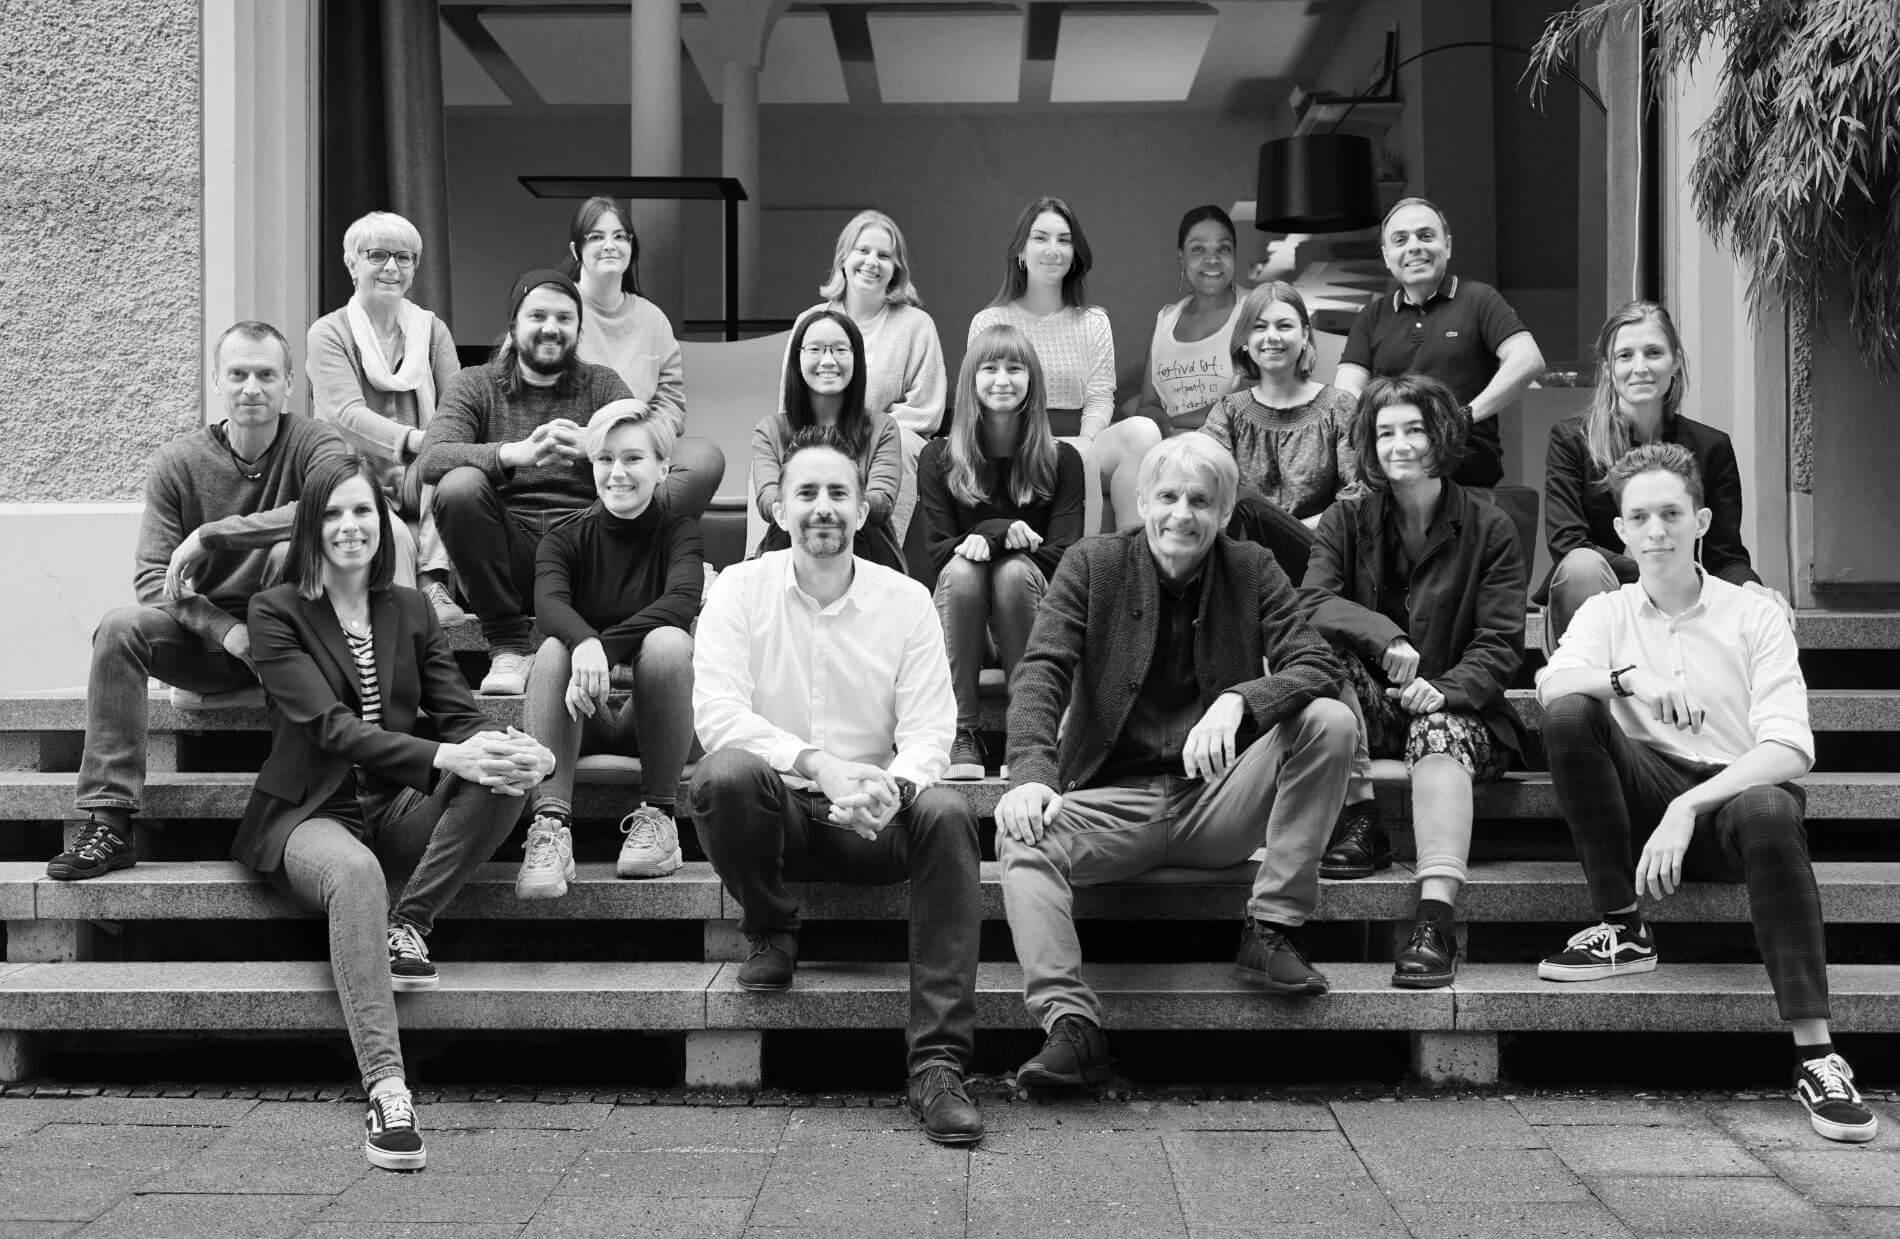 ott-architekten-teamfoto-sw-2021